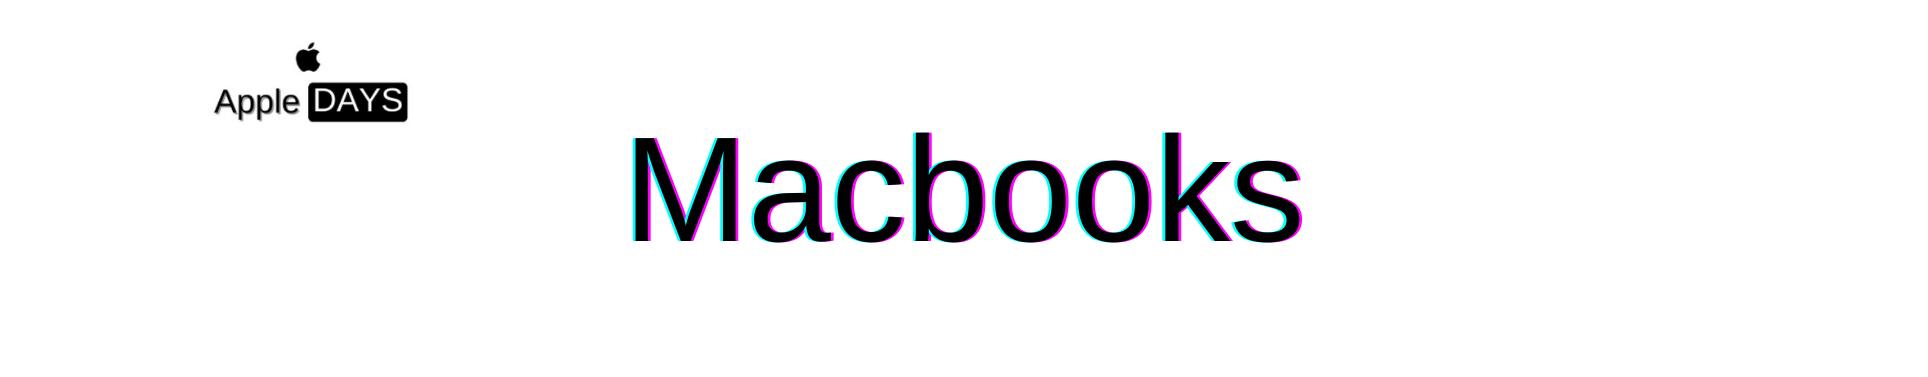 appledays_macbooks_webapp